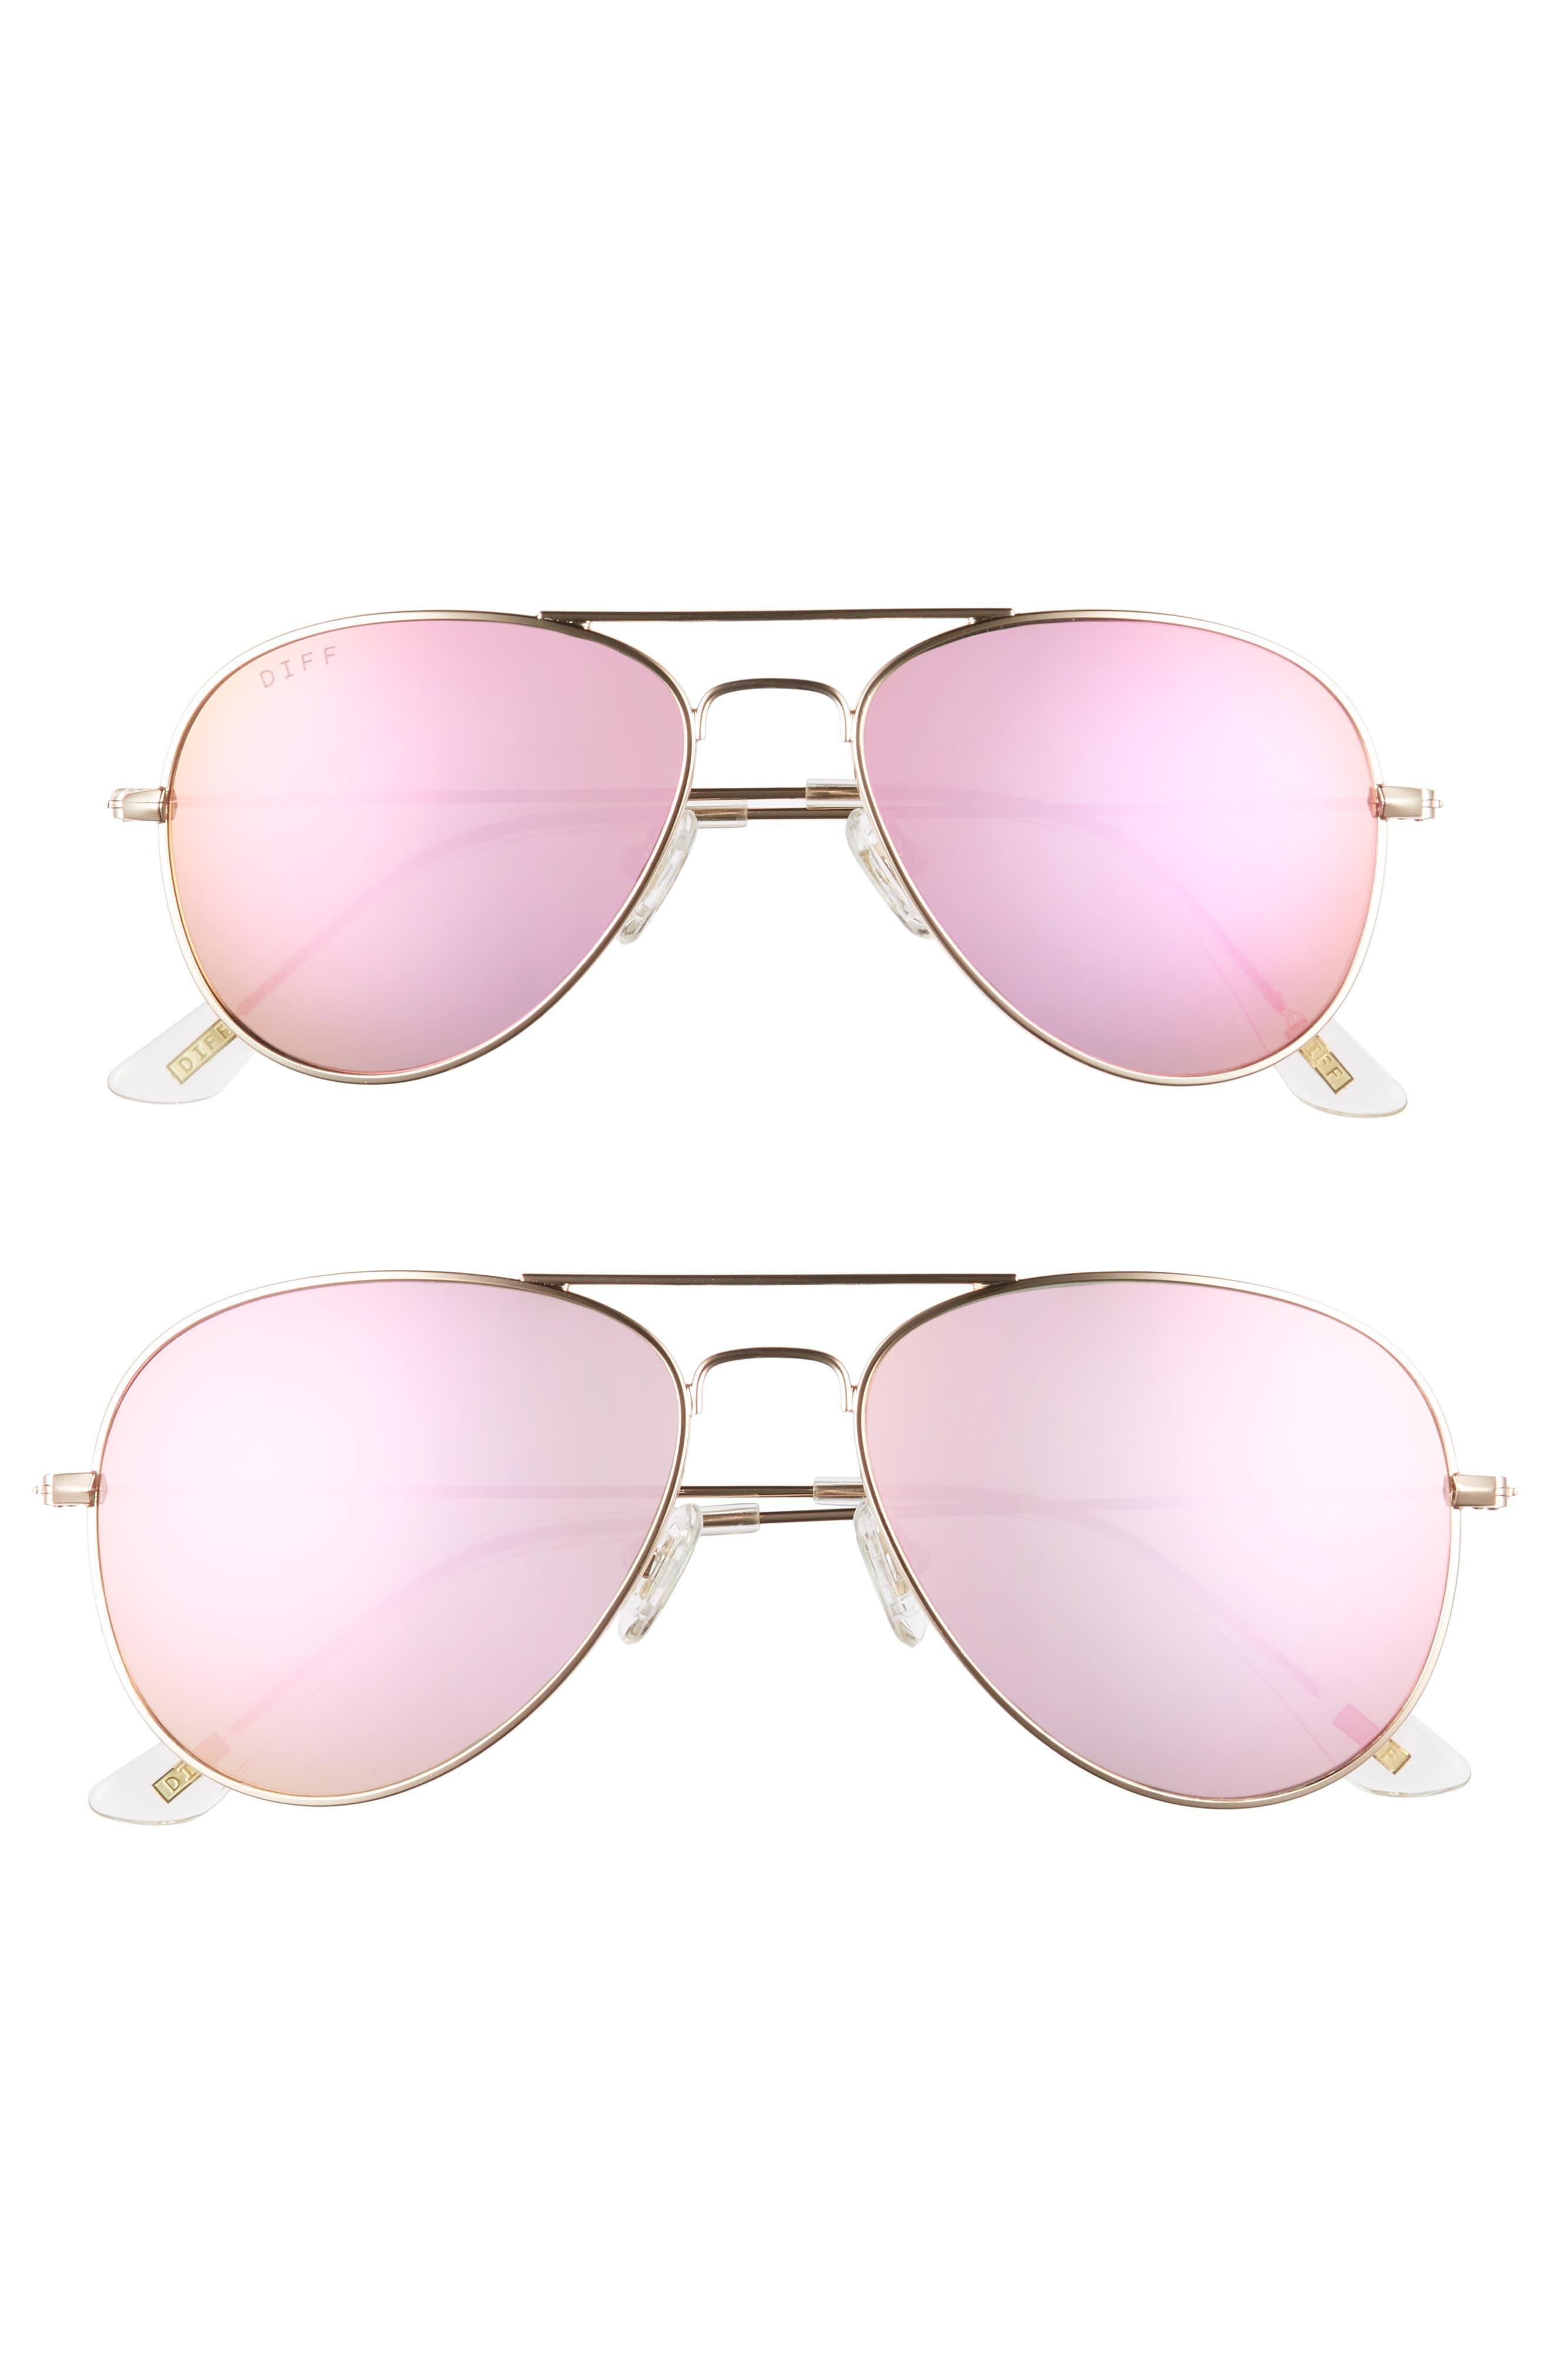 Mommy & Me Cruz 2-Pack Aviator Sunglasses,                             Main thumbnail 1, color,                             710